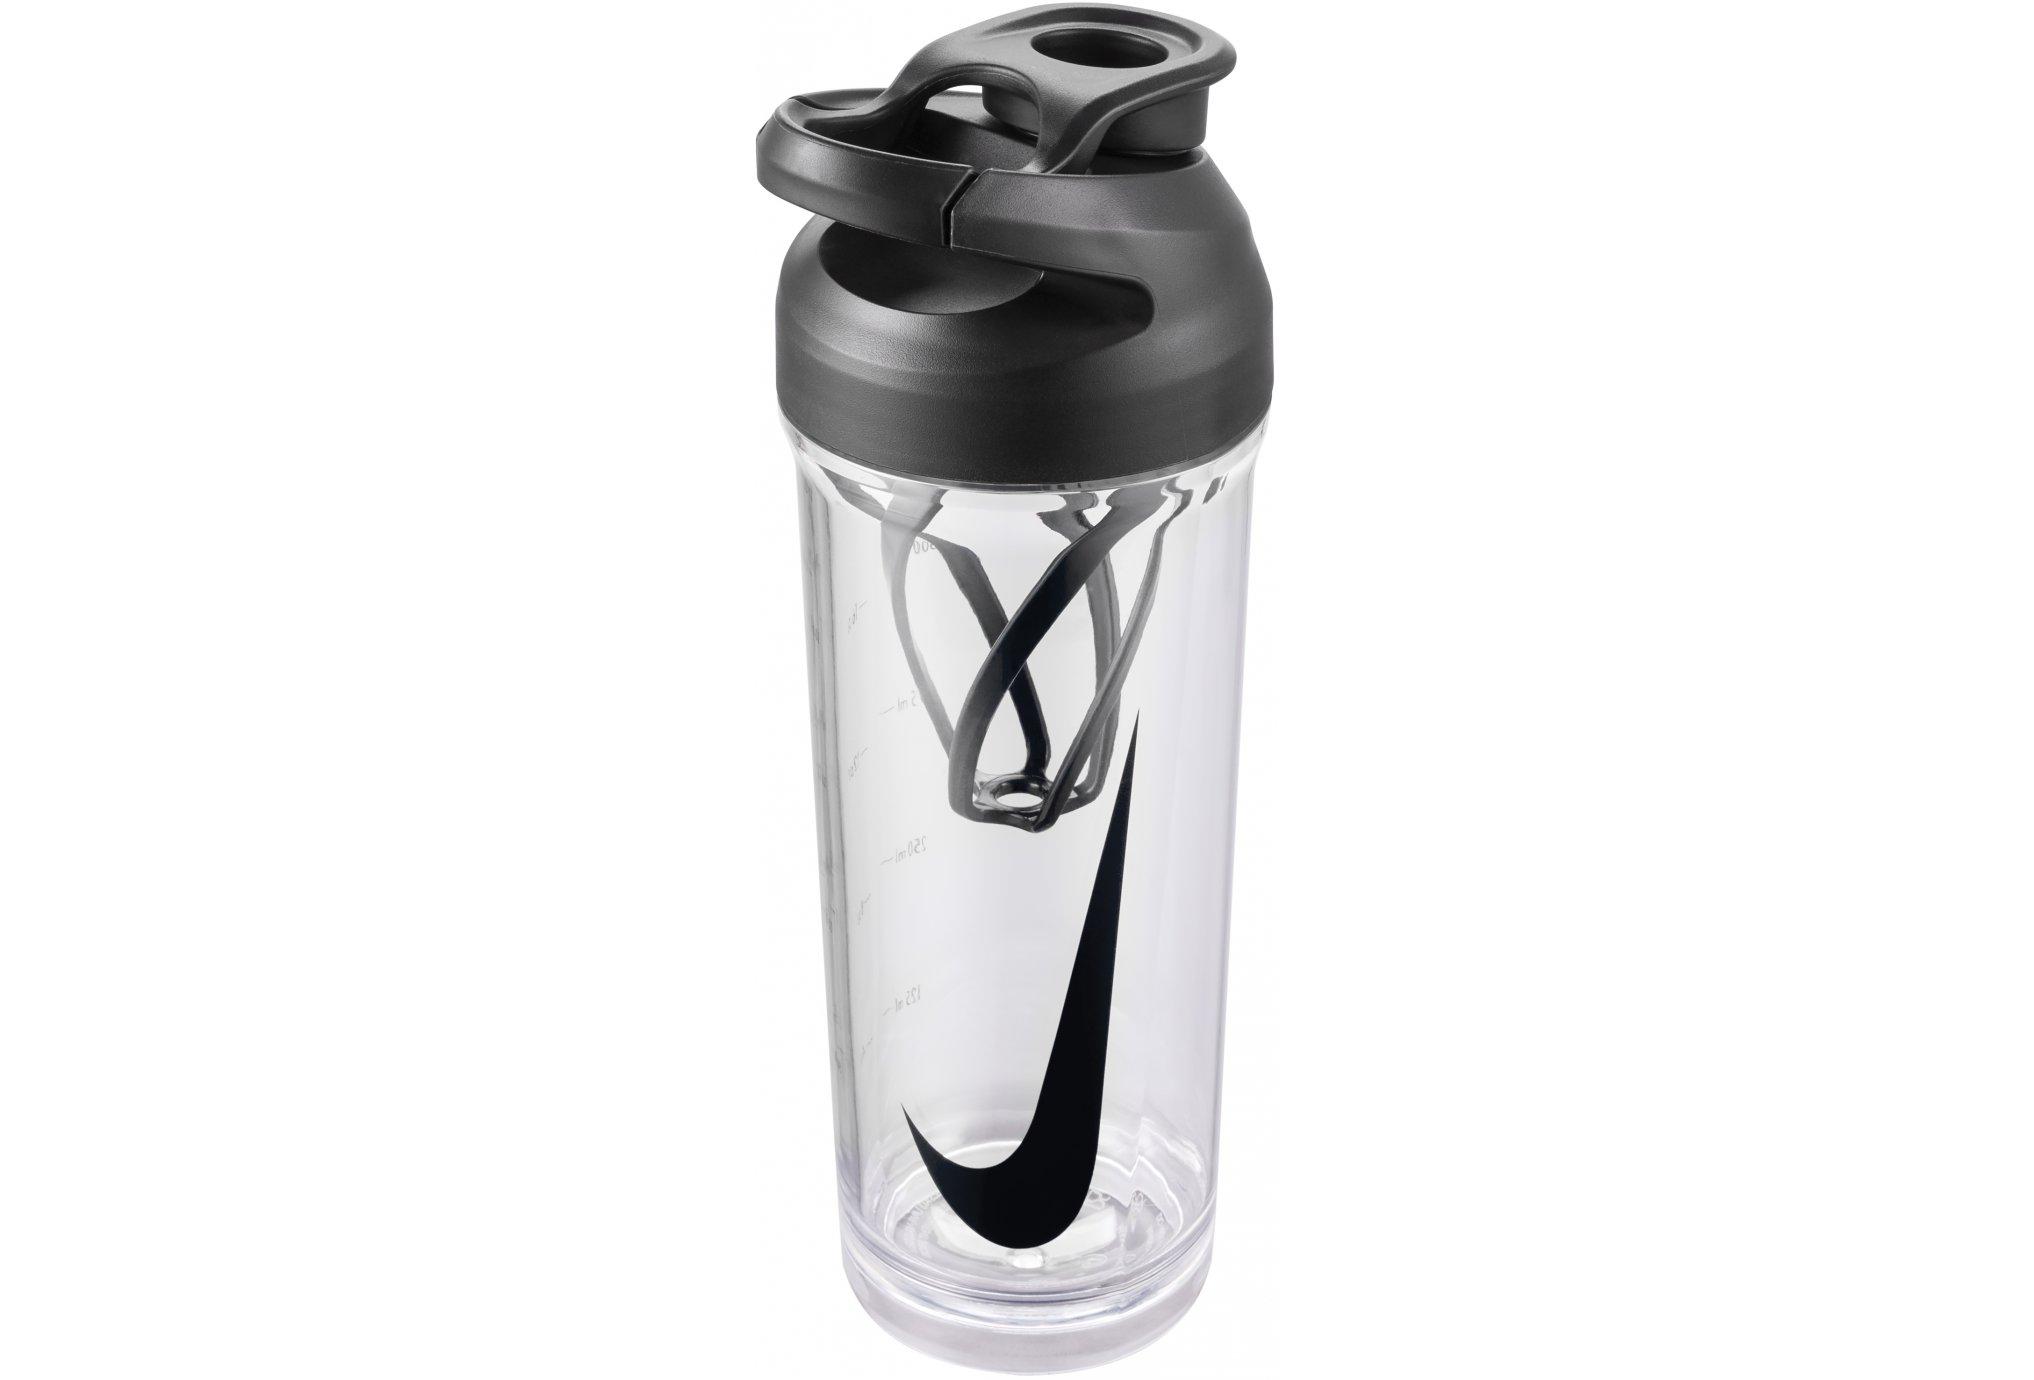 Nike Hypercharge Shaker 710 mL Sac hydratation / Gourde